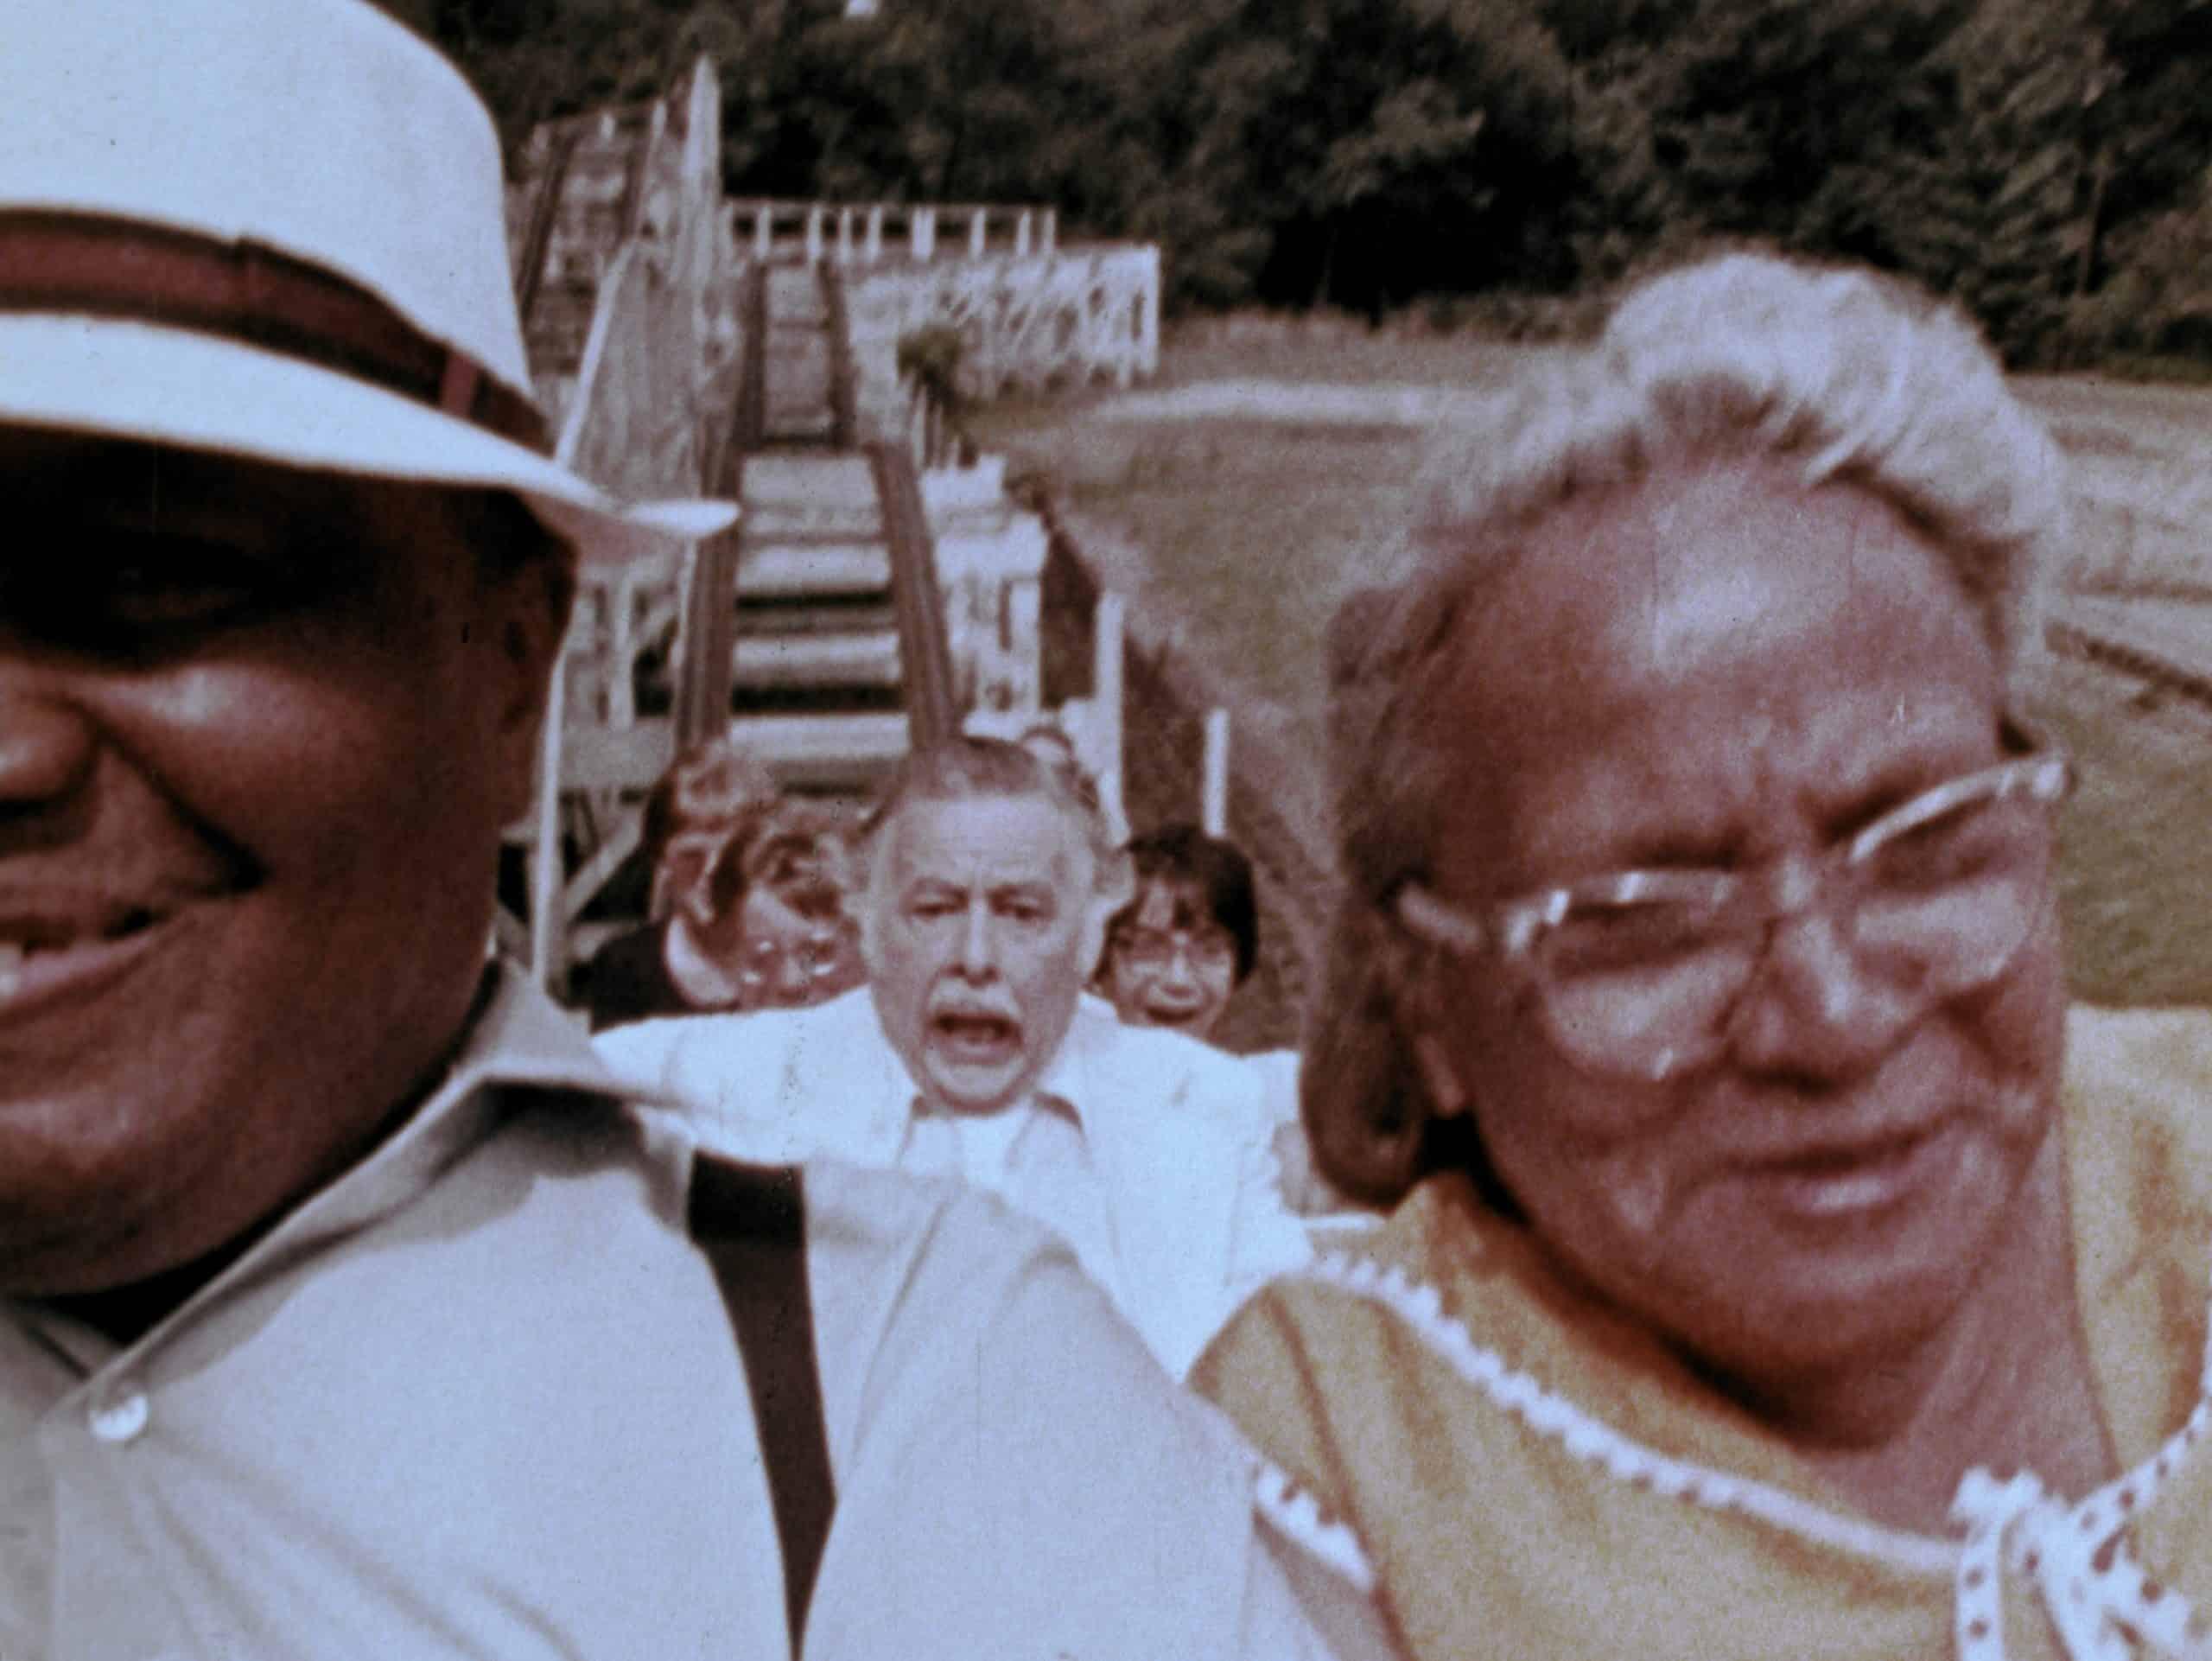 George Romero's lost film The Amusement Park returns via Shudder (2021) 2